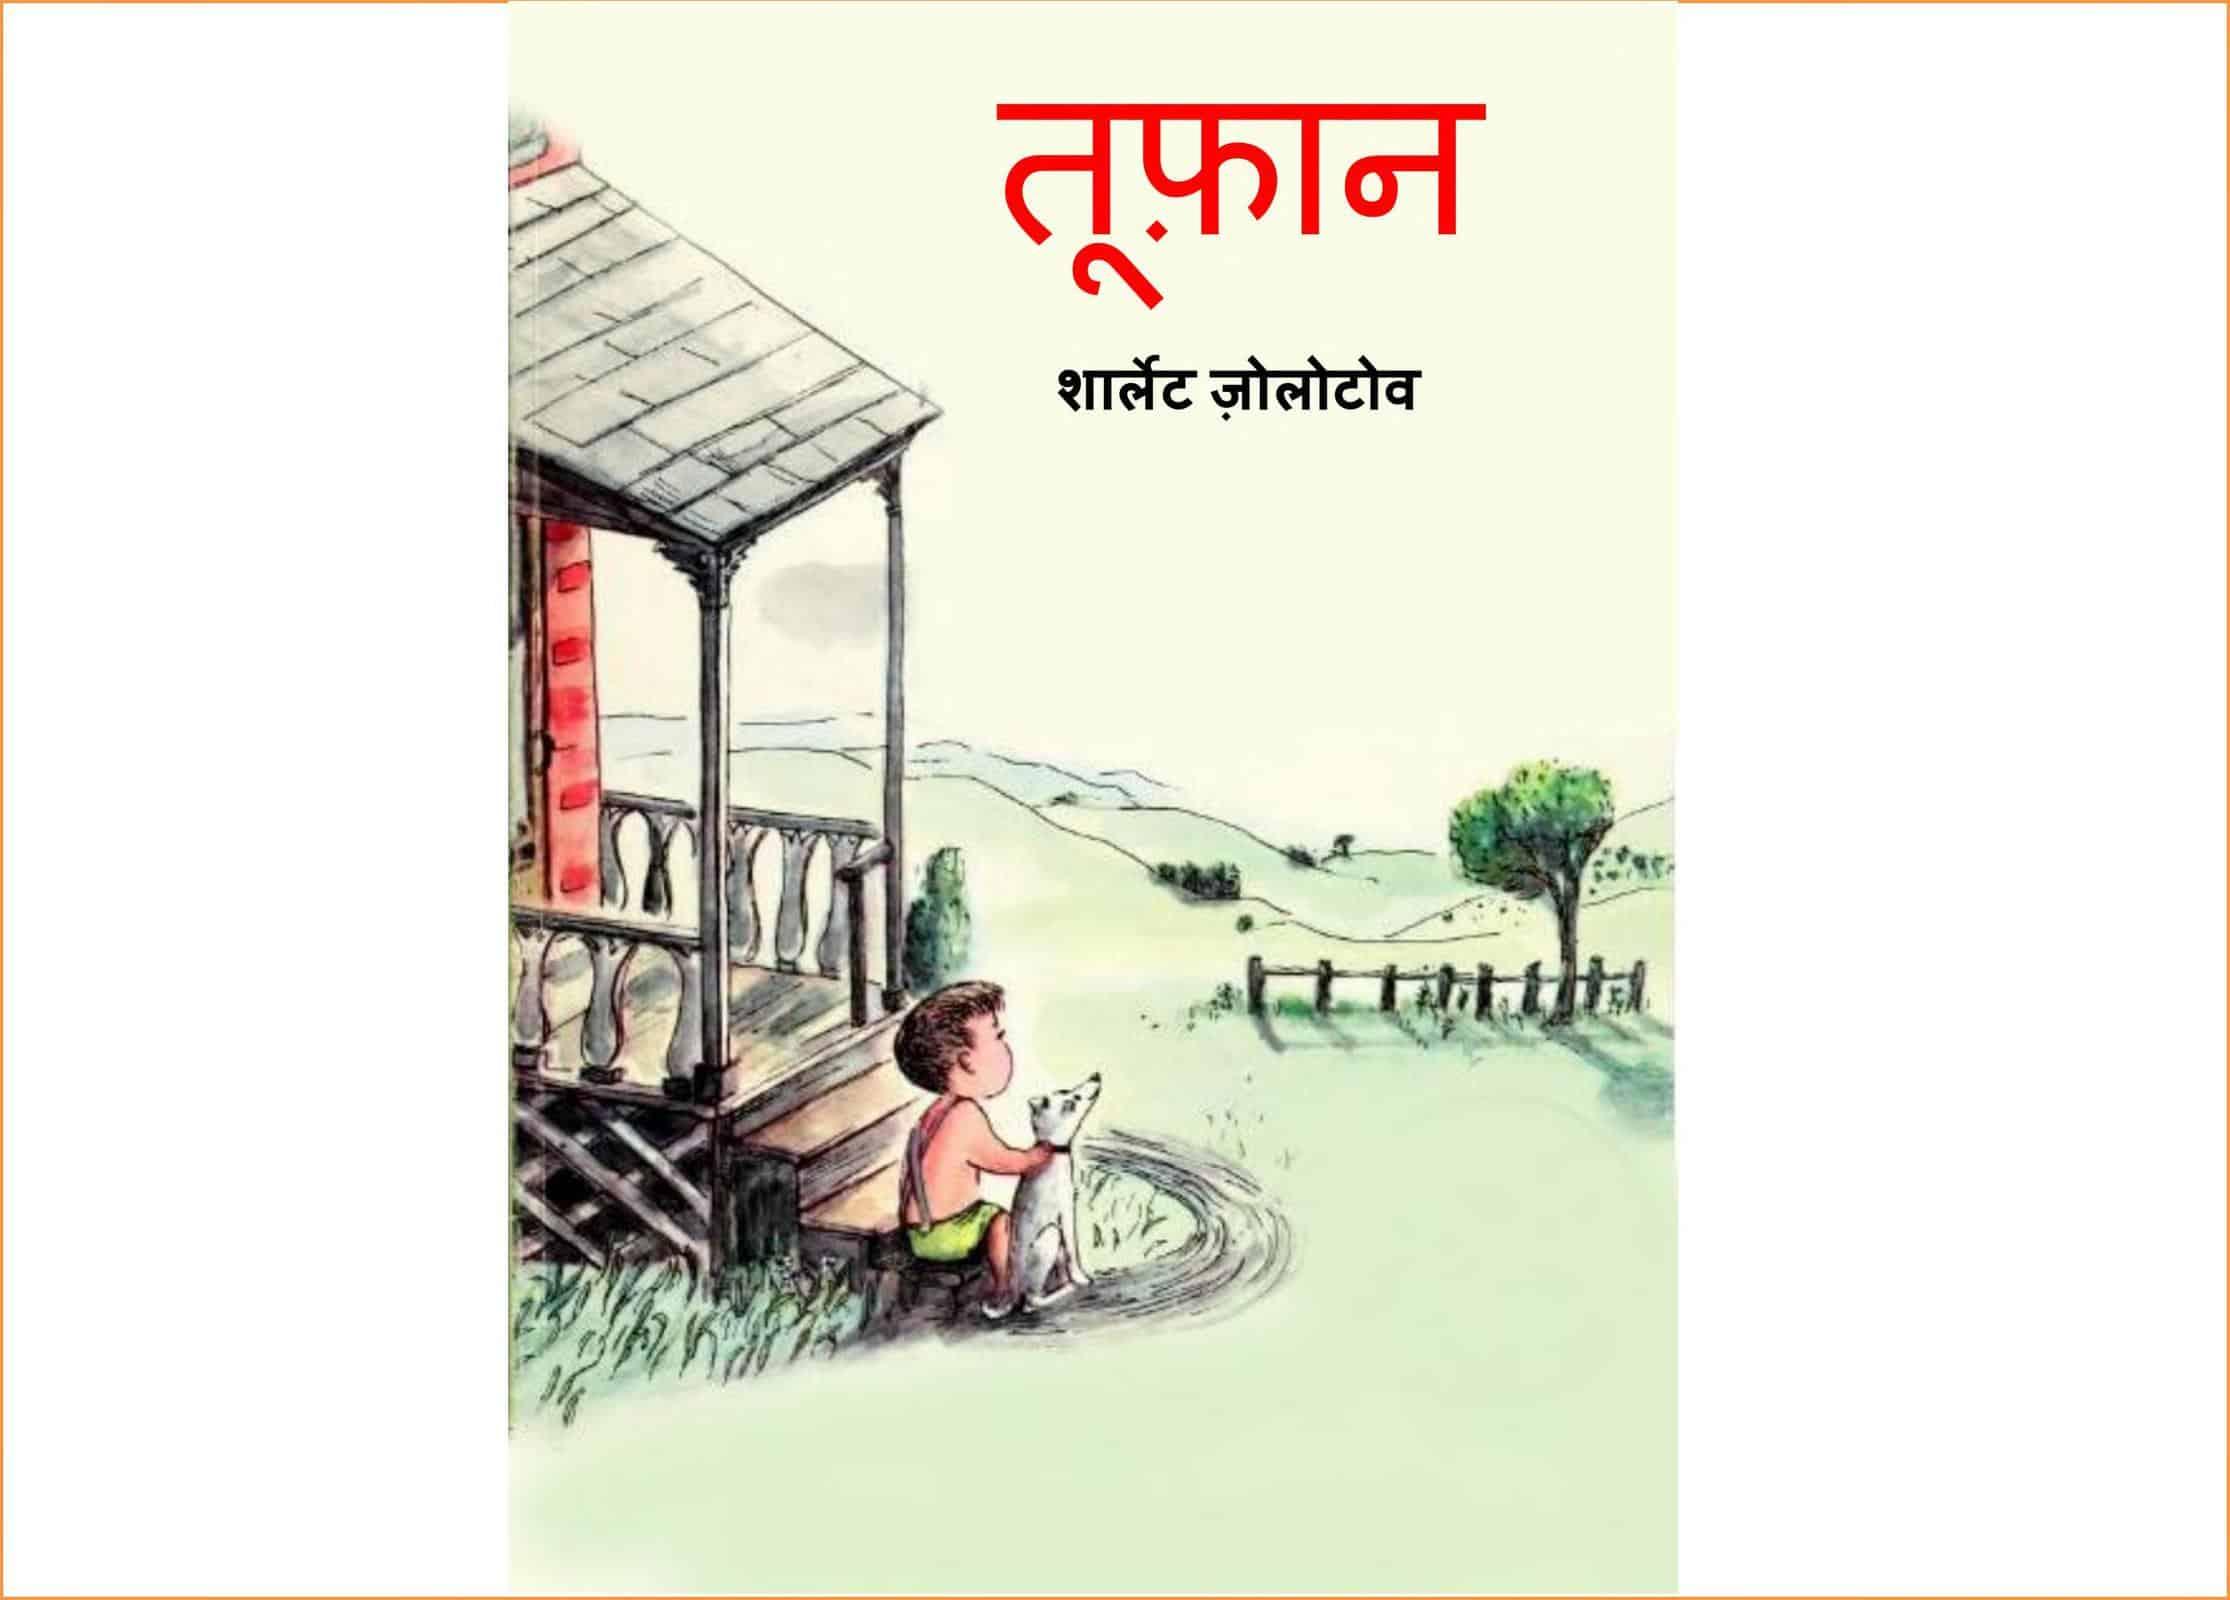 Toofan by पुस्तक समूह - Pustak Samuh